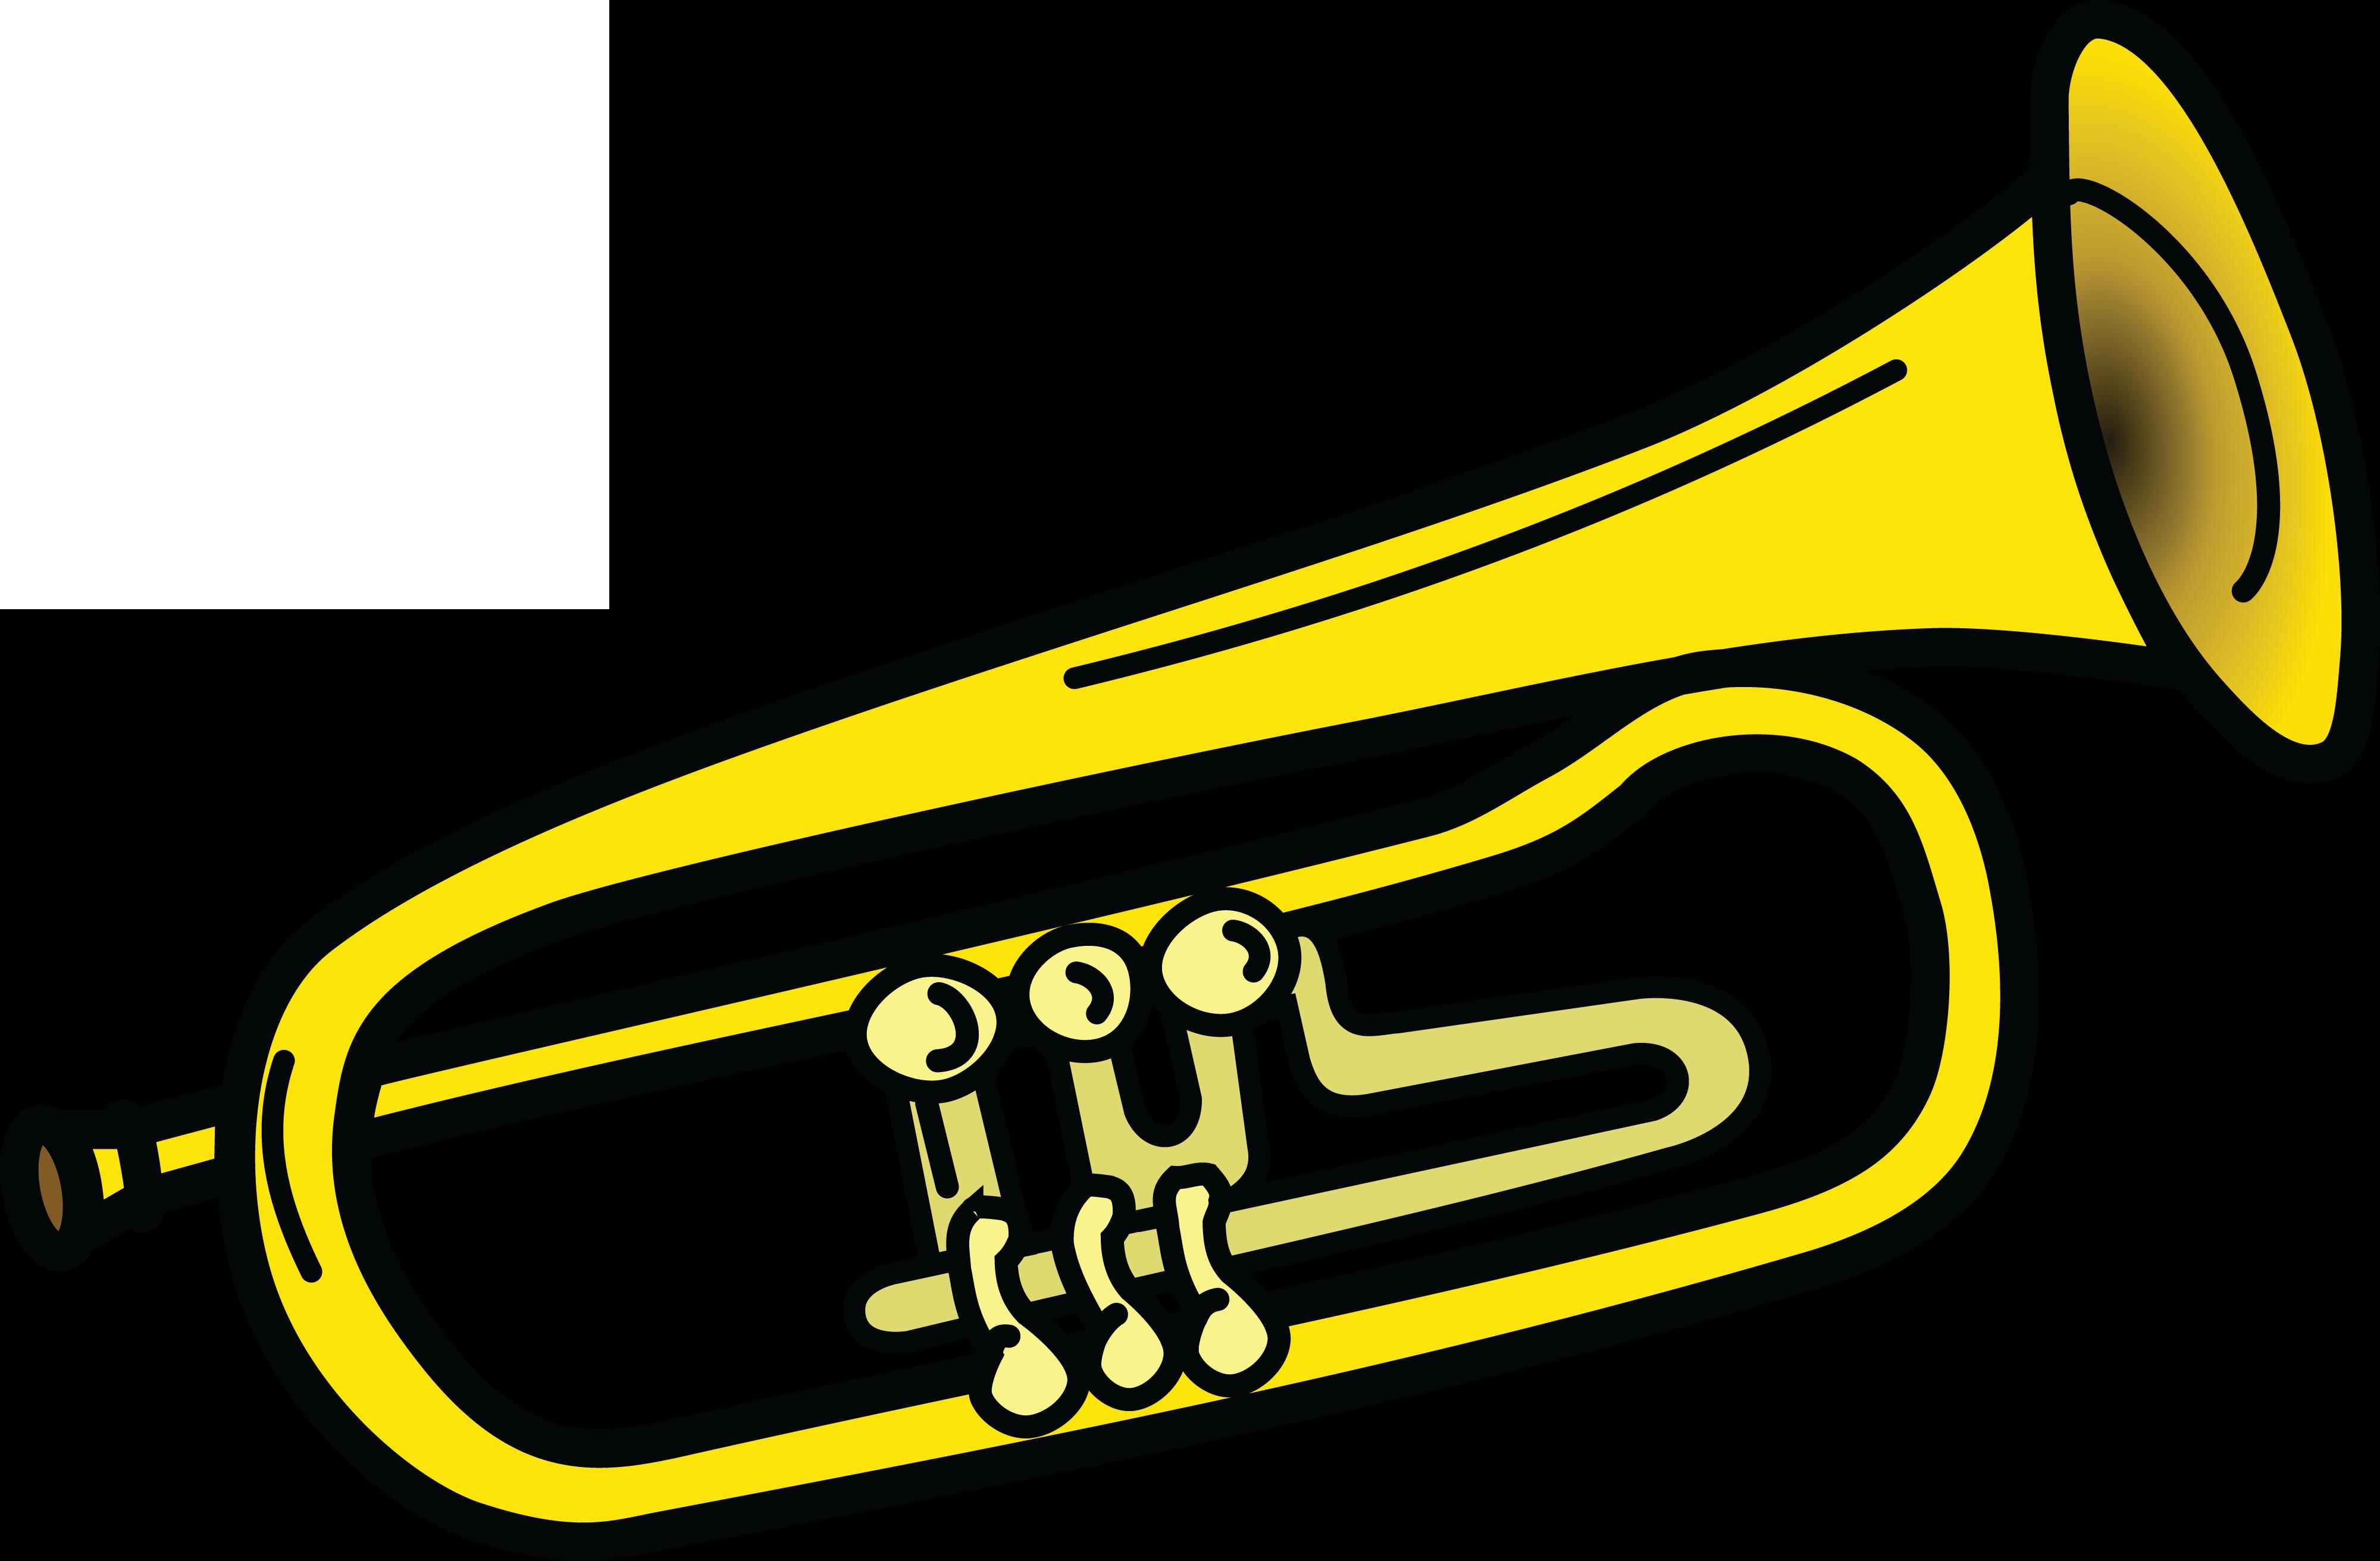 Trumpet Clip Art Free, Trumpet Transparent PNG Images.